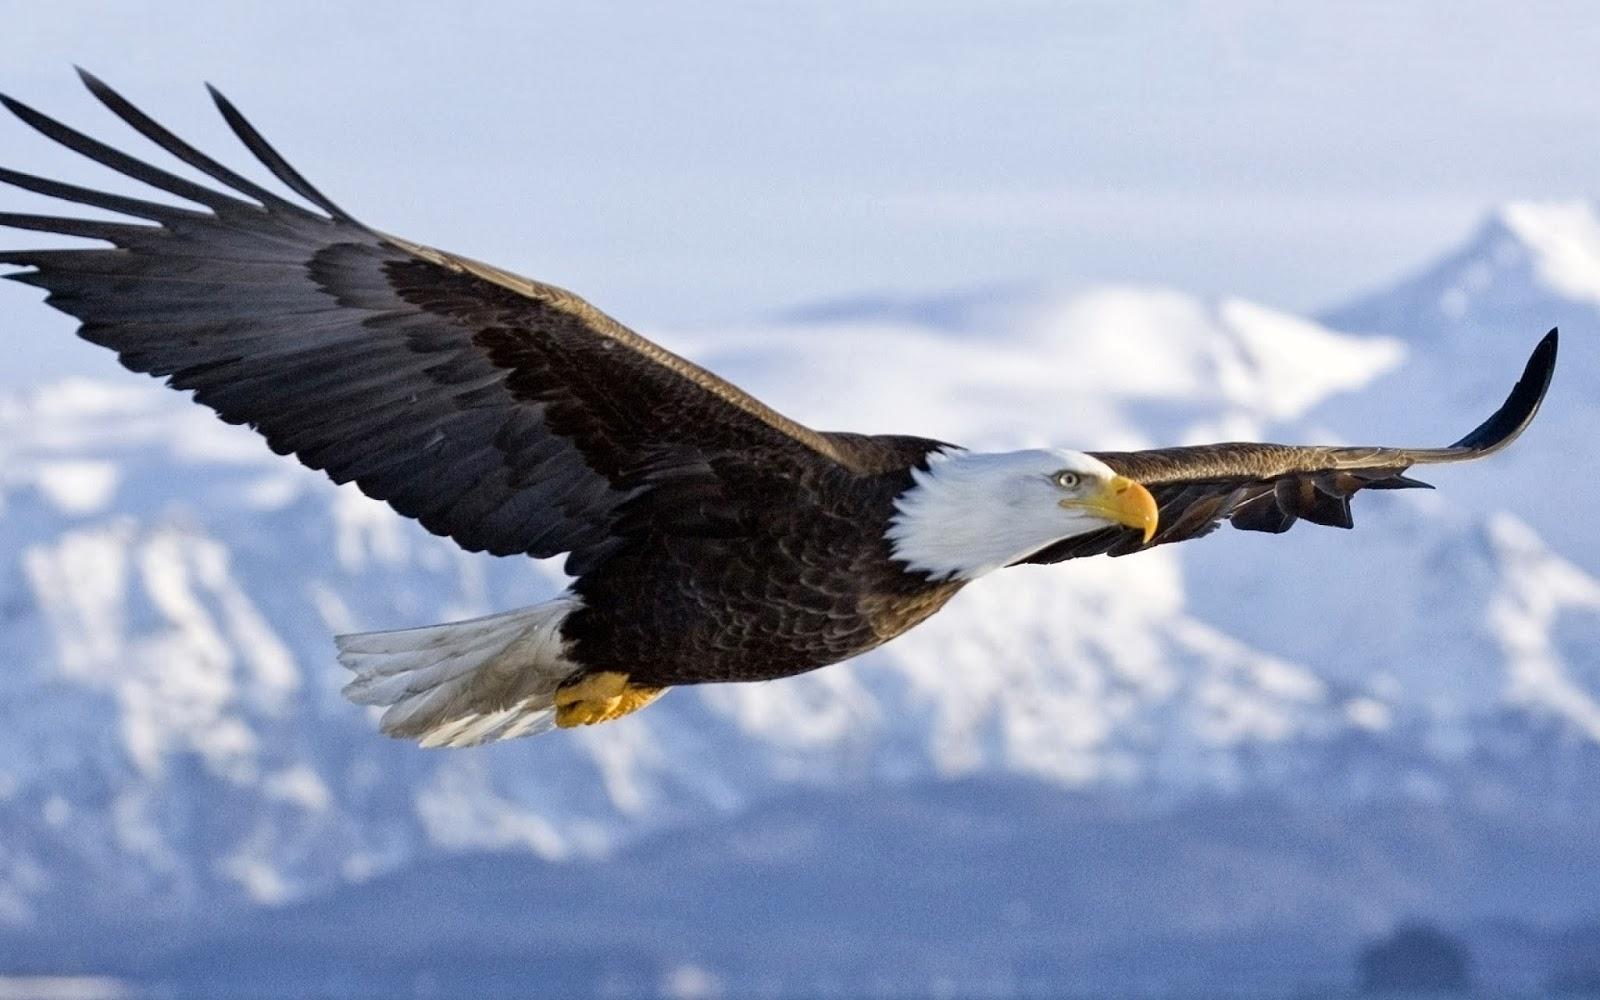 Wallpapers 4 u Download 3D Flying Bald Eagle HD Wallpaper 1600x1000